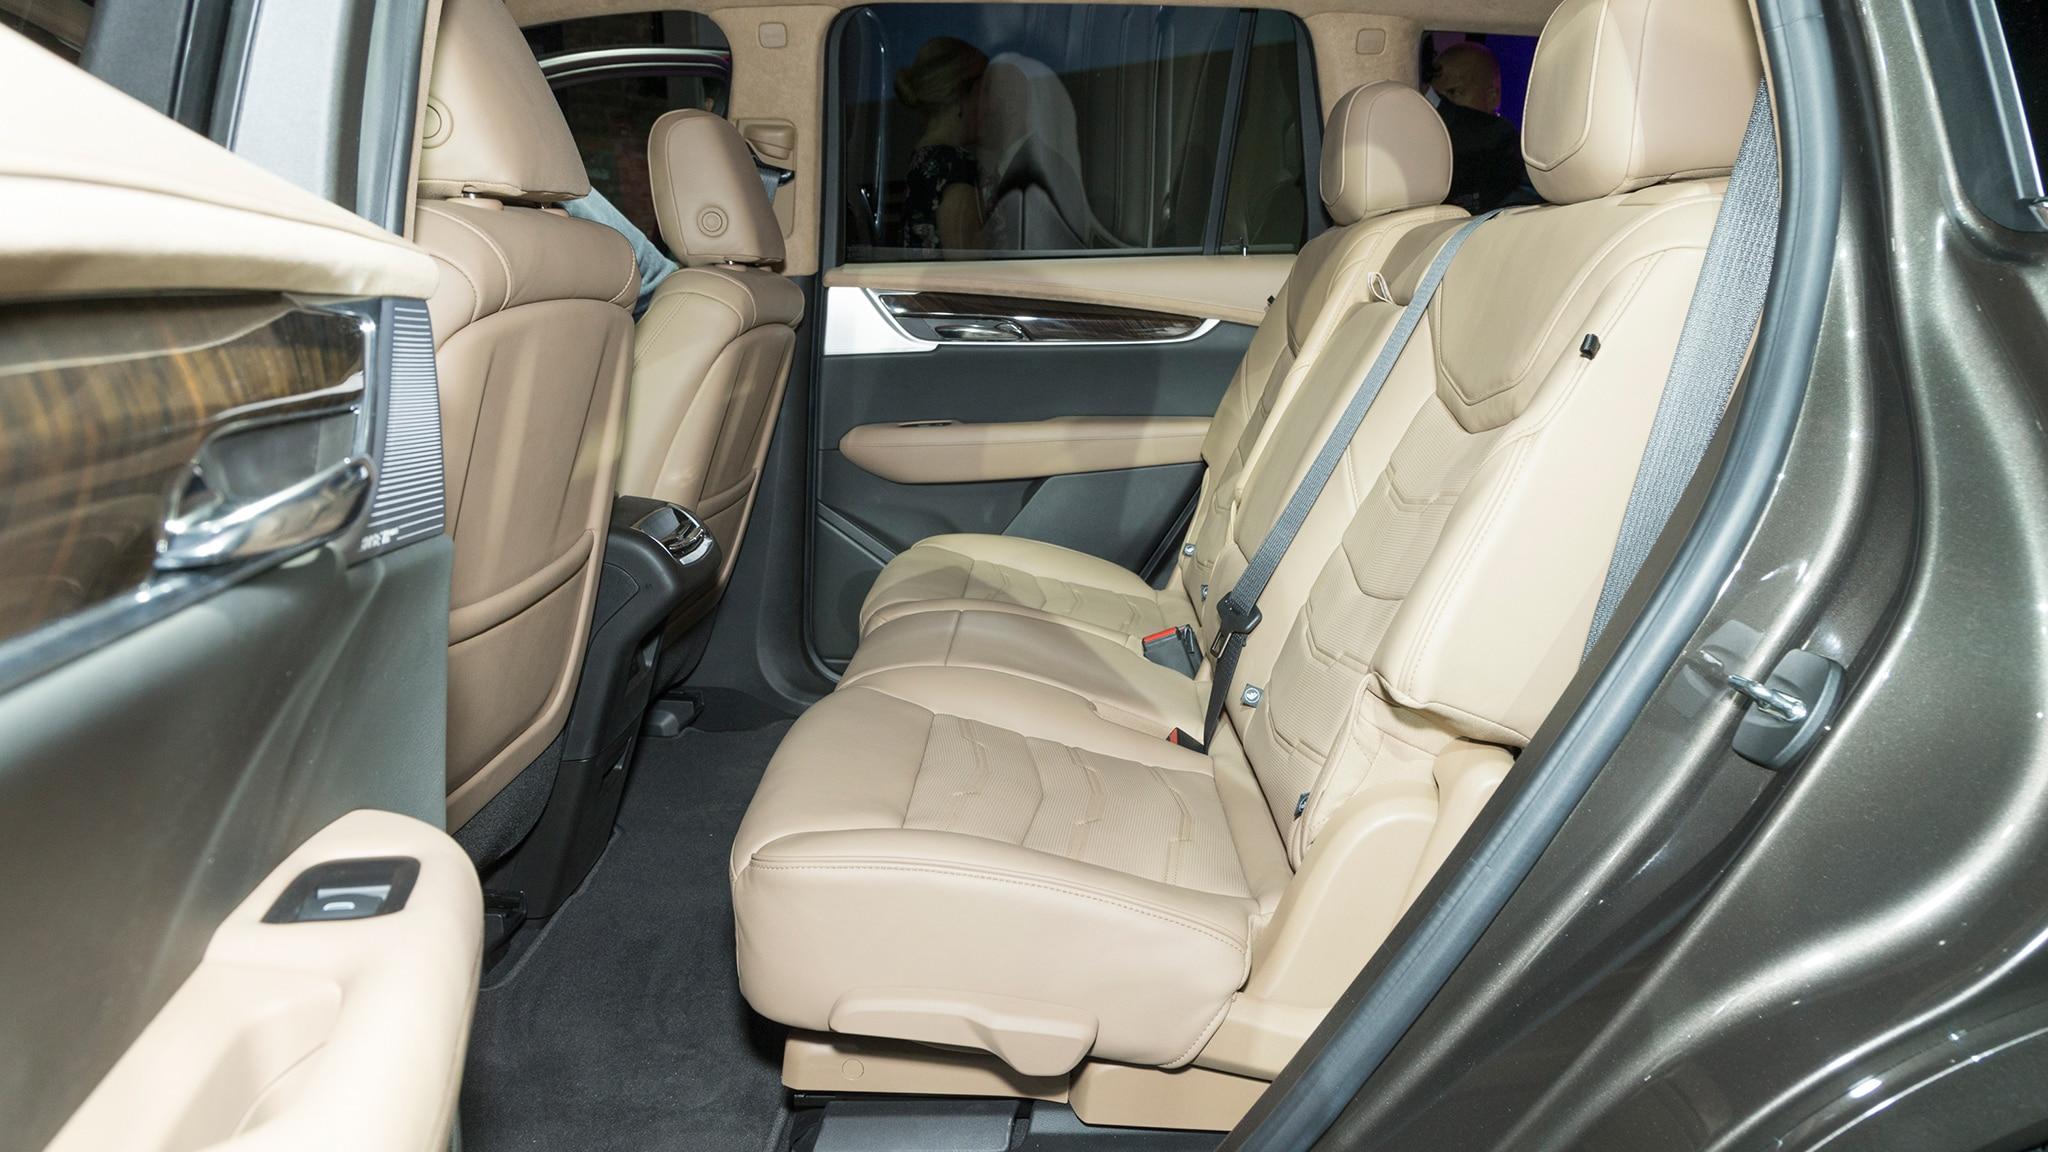 2020 Cadillac Xt6 Reveal Interior Second Row Motor Trend En Español